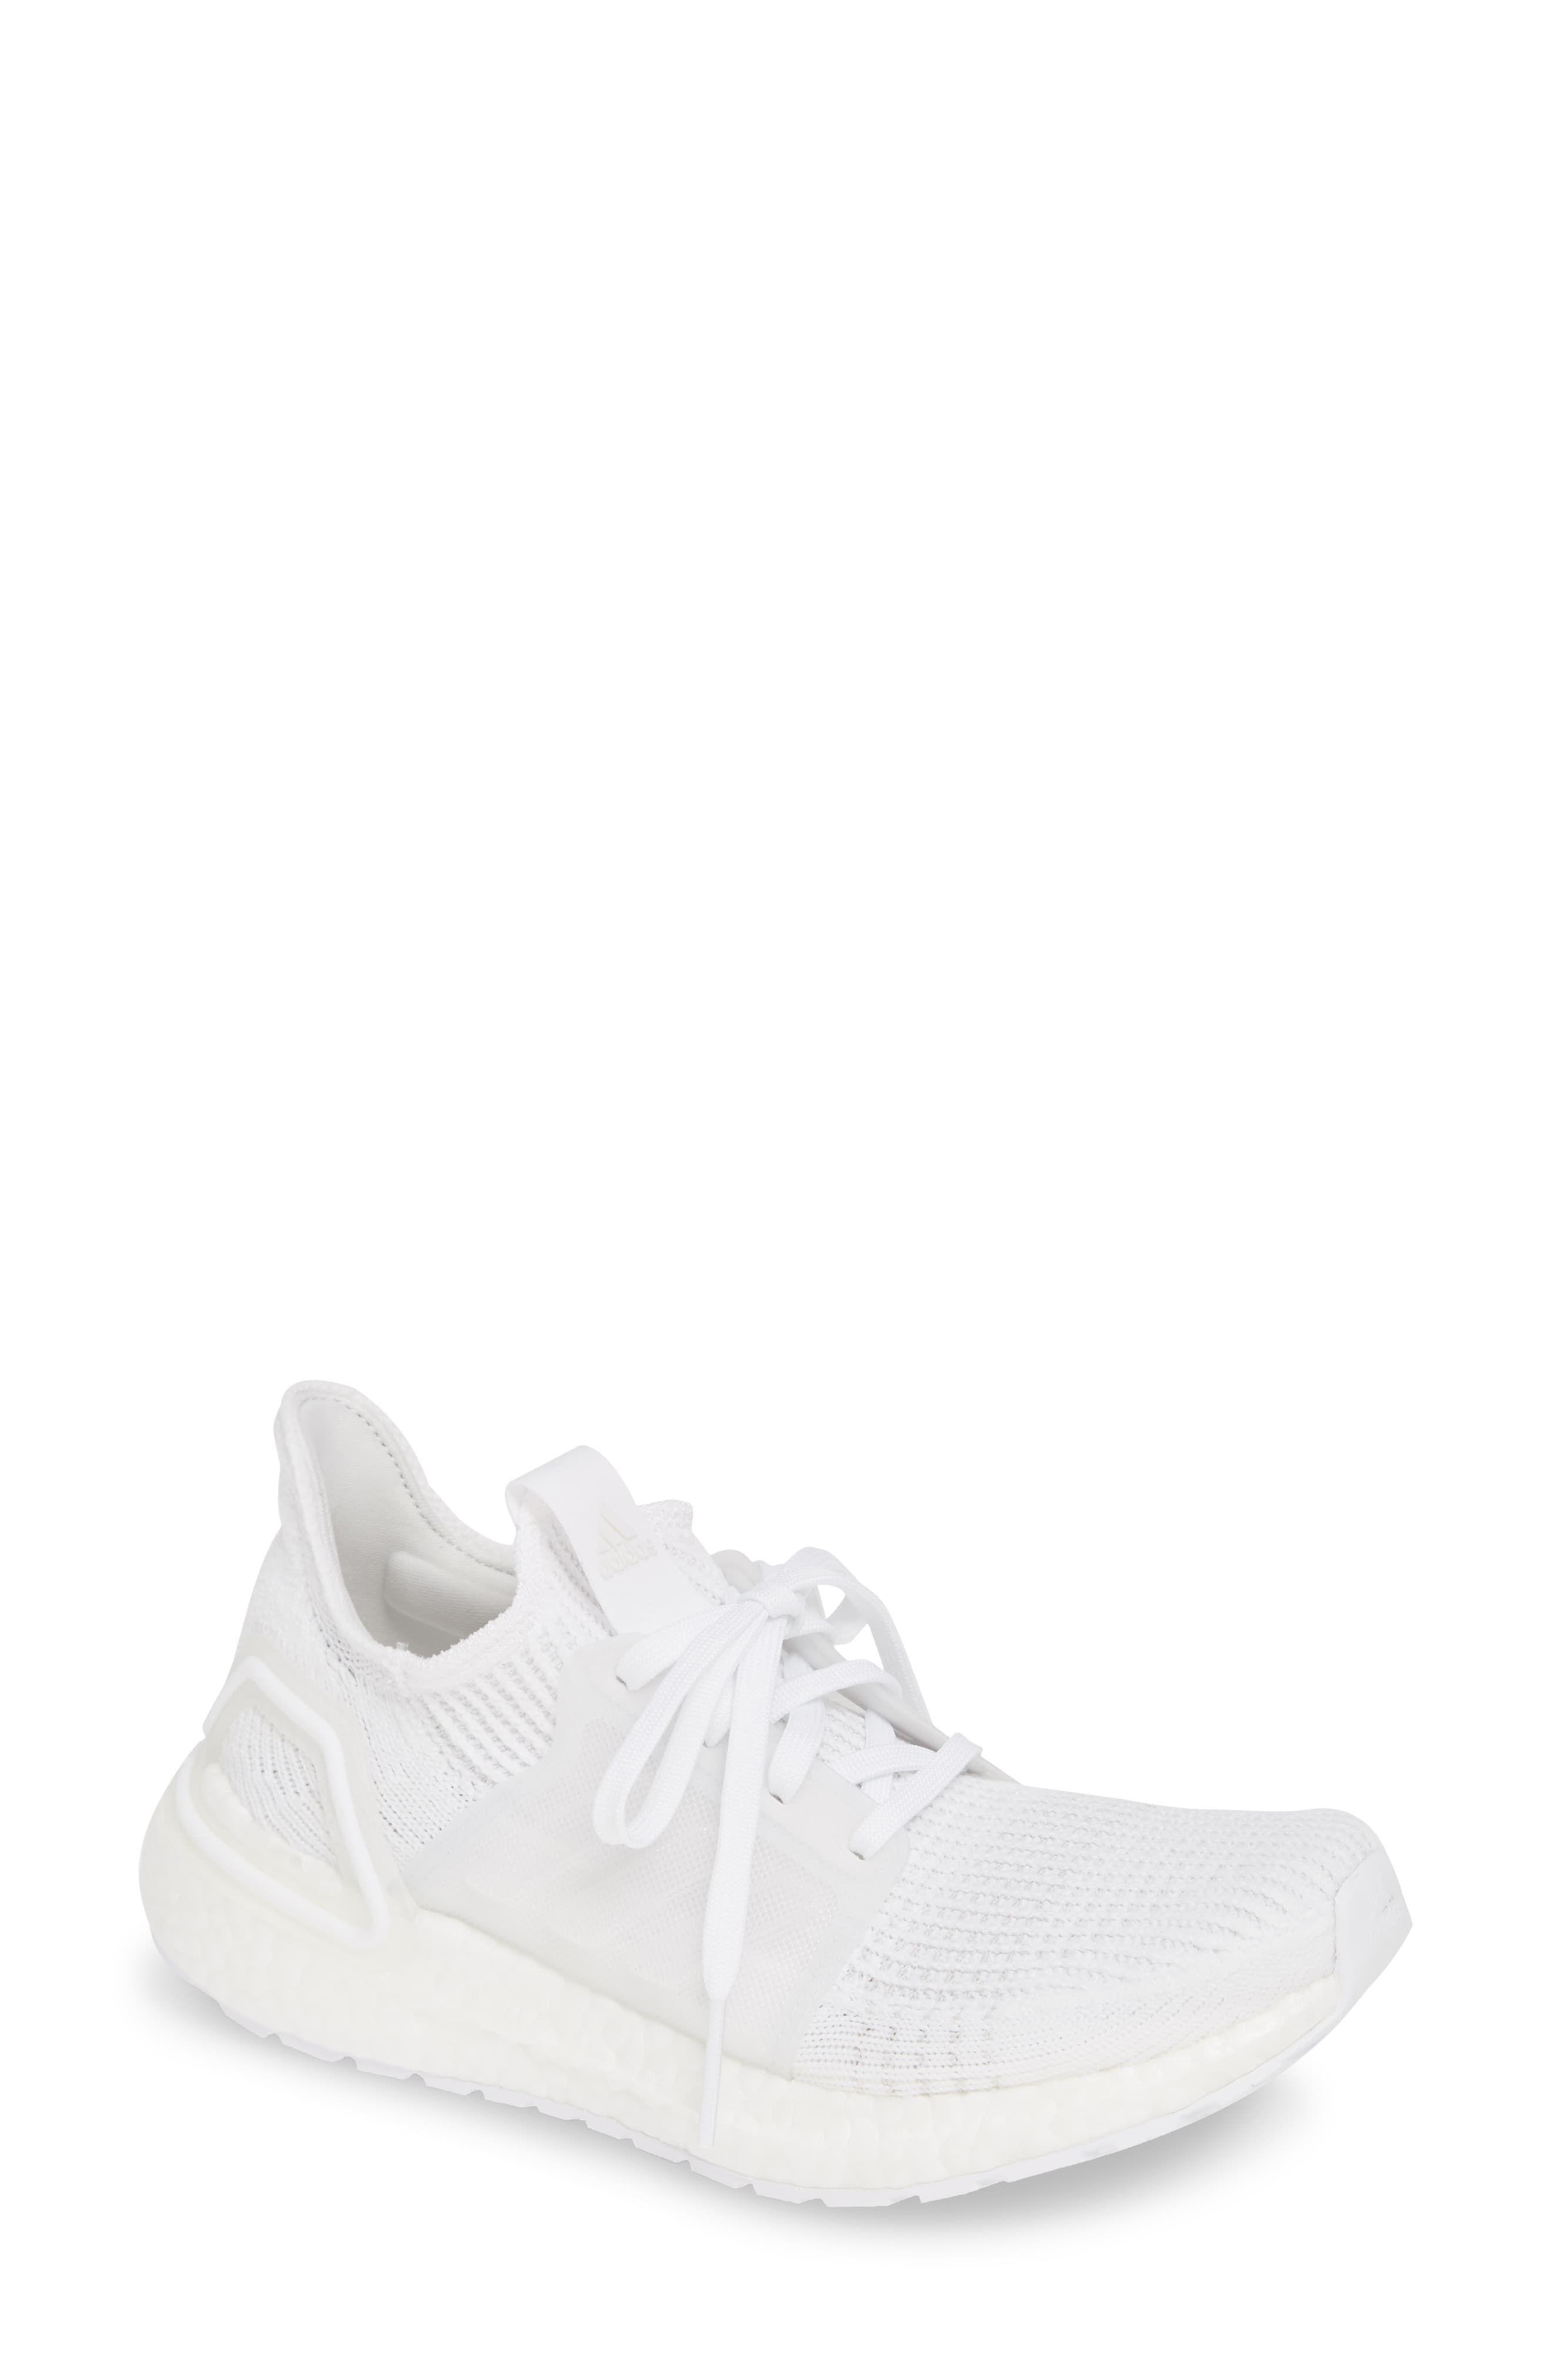 Women's Adidas Ultraboost 19 Running Shoe, Size 11 M Blue